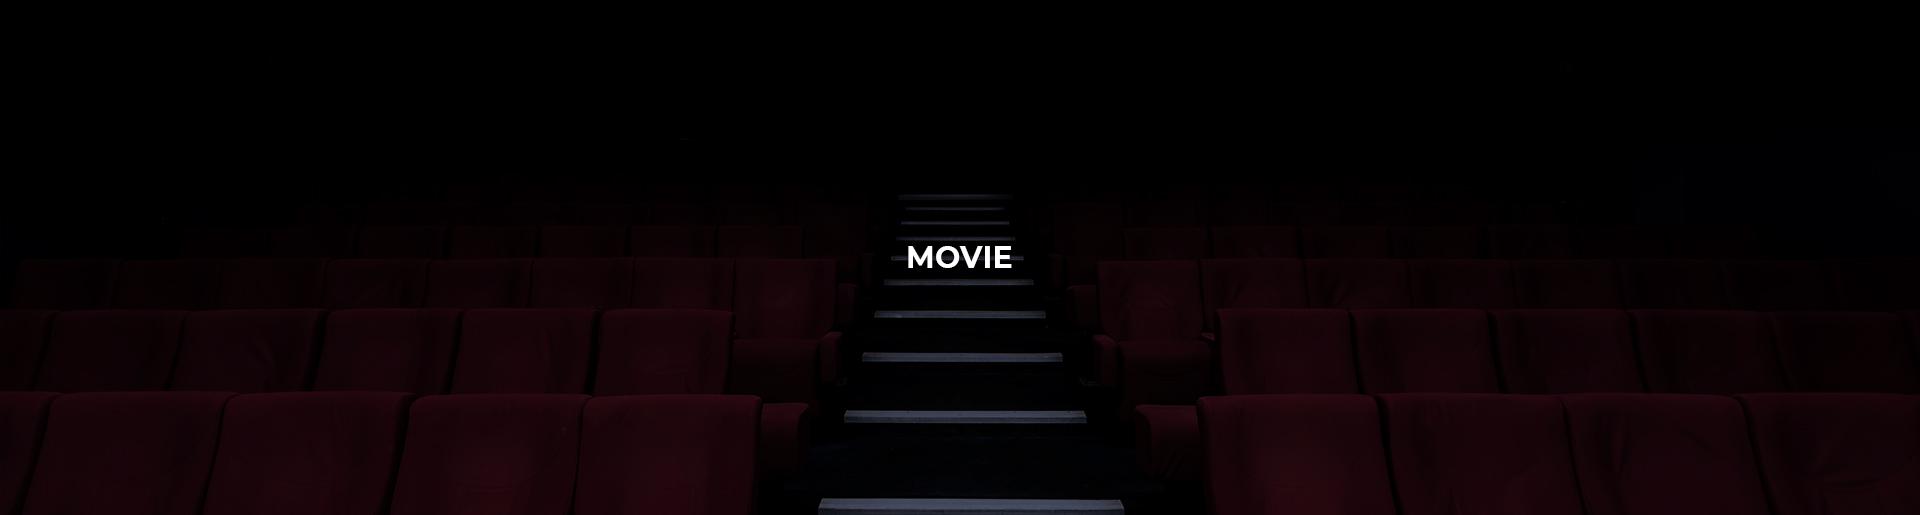 movie_t.jpg